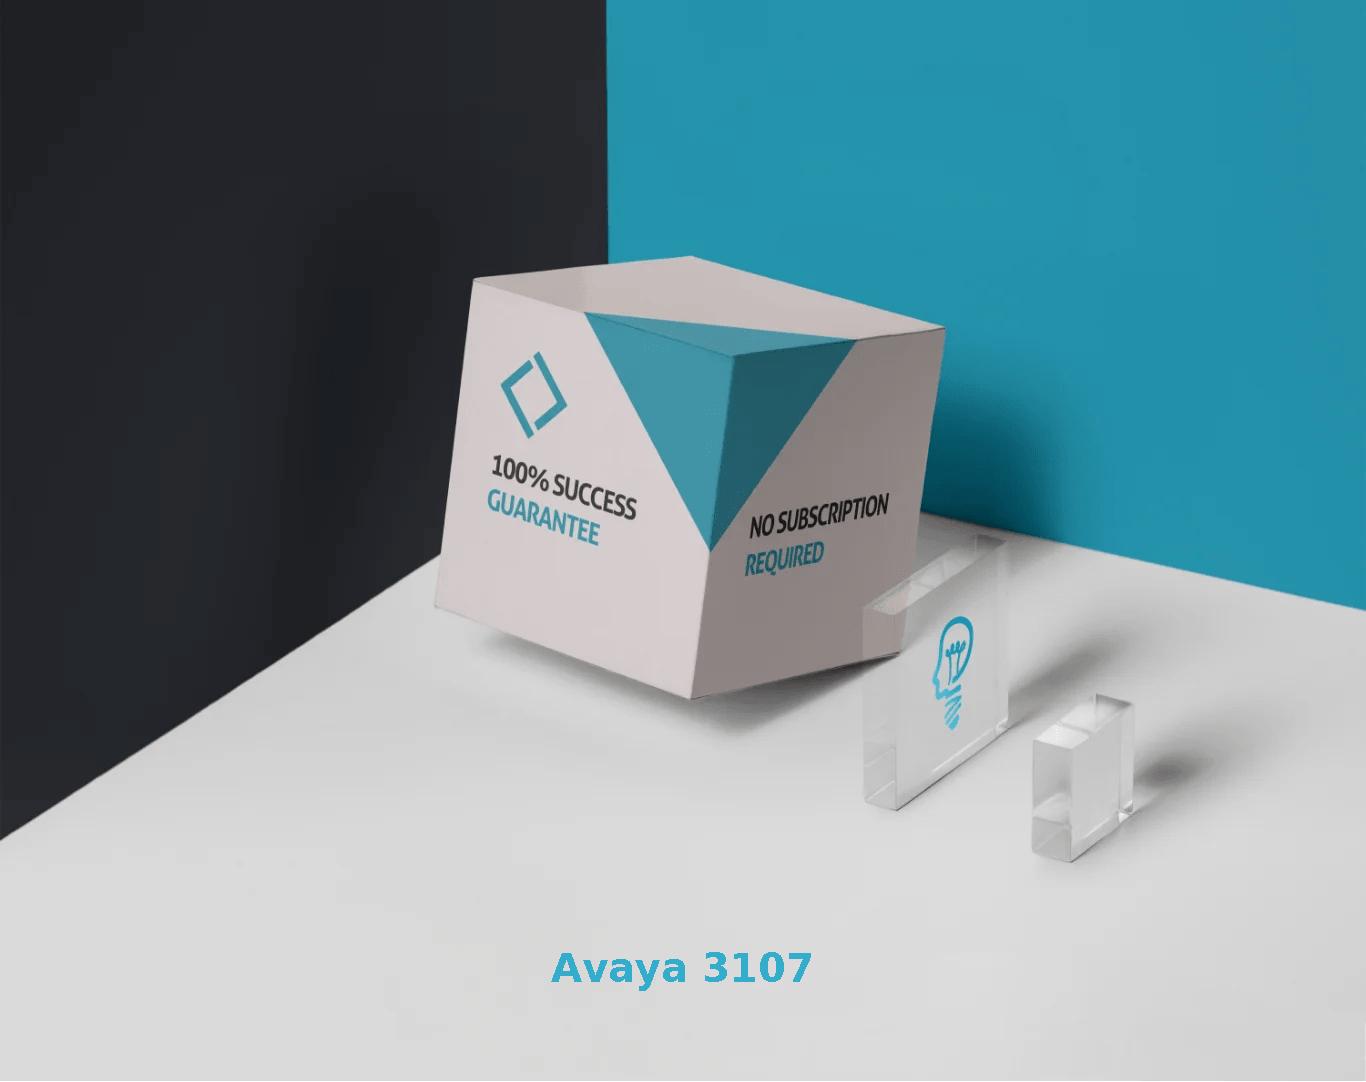 Avaya 3107 Exams